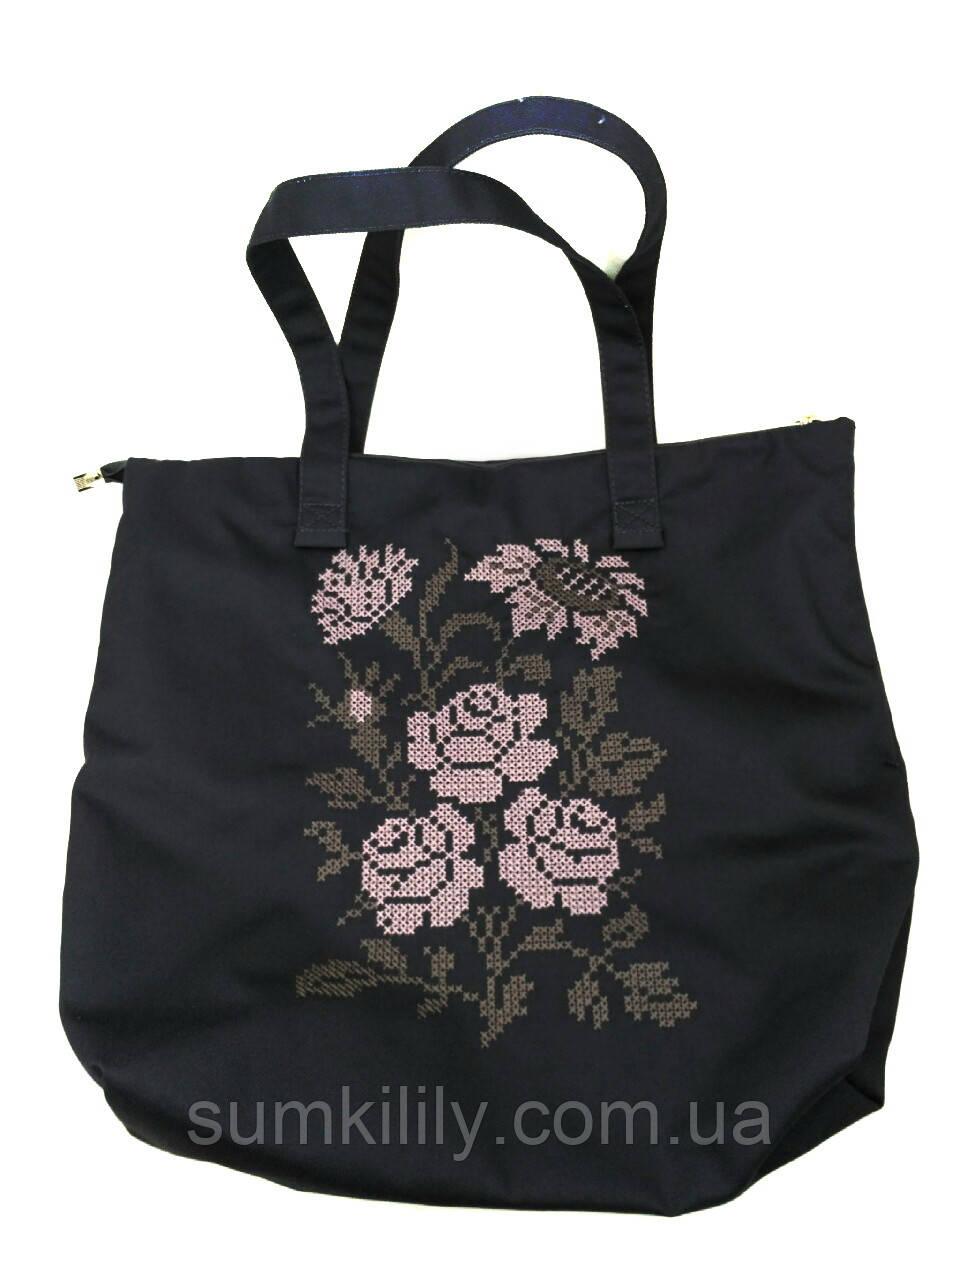 Текстильна сумка з вишивкою Шопер 27